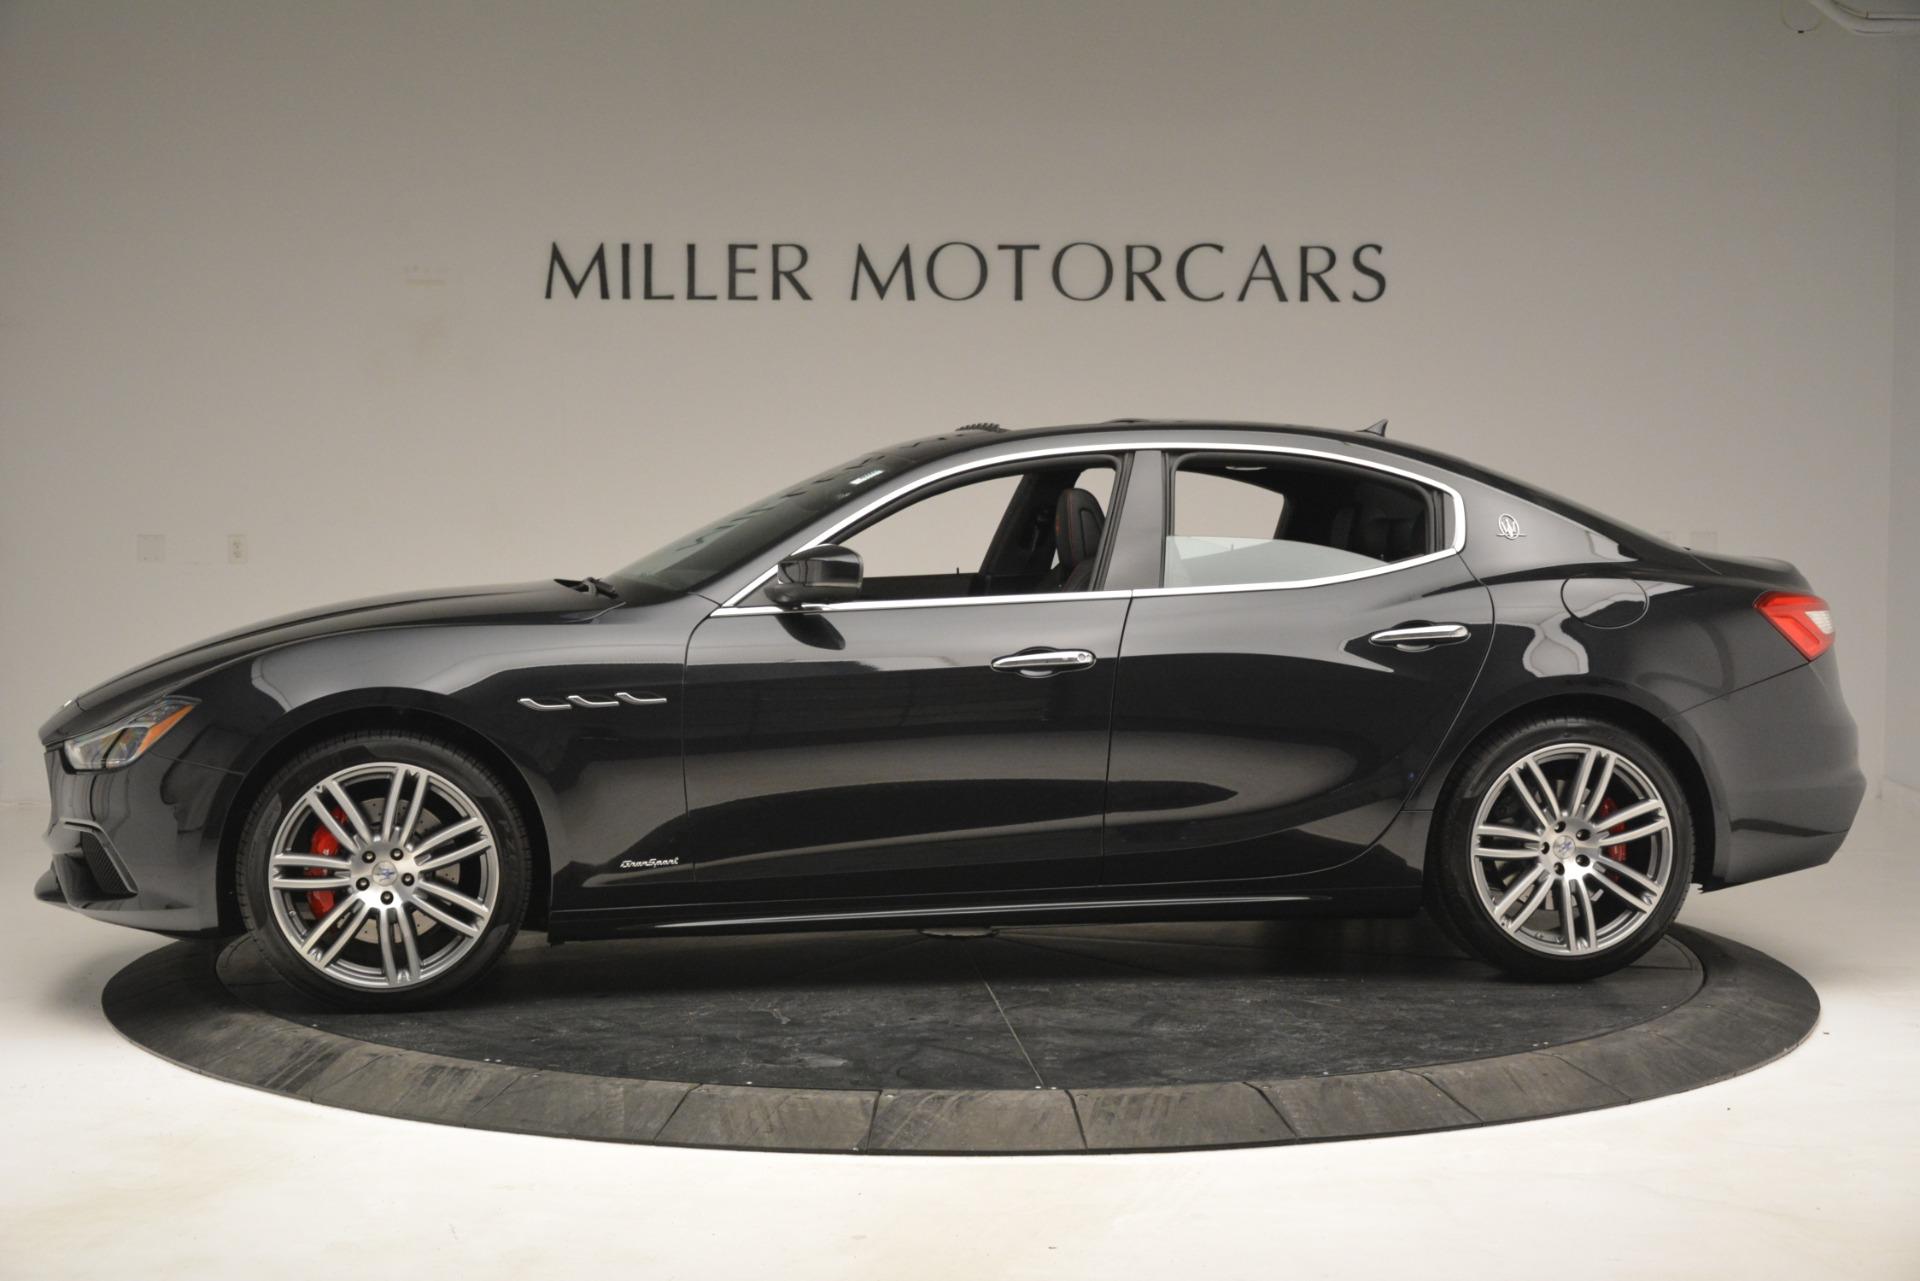 New 2019 Maserati Ghibli S Q4 GranSport For Sale In Greenwich, CT. Alfa Romeo of Greenwich, W634 2614_p3